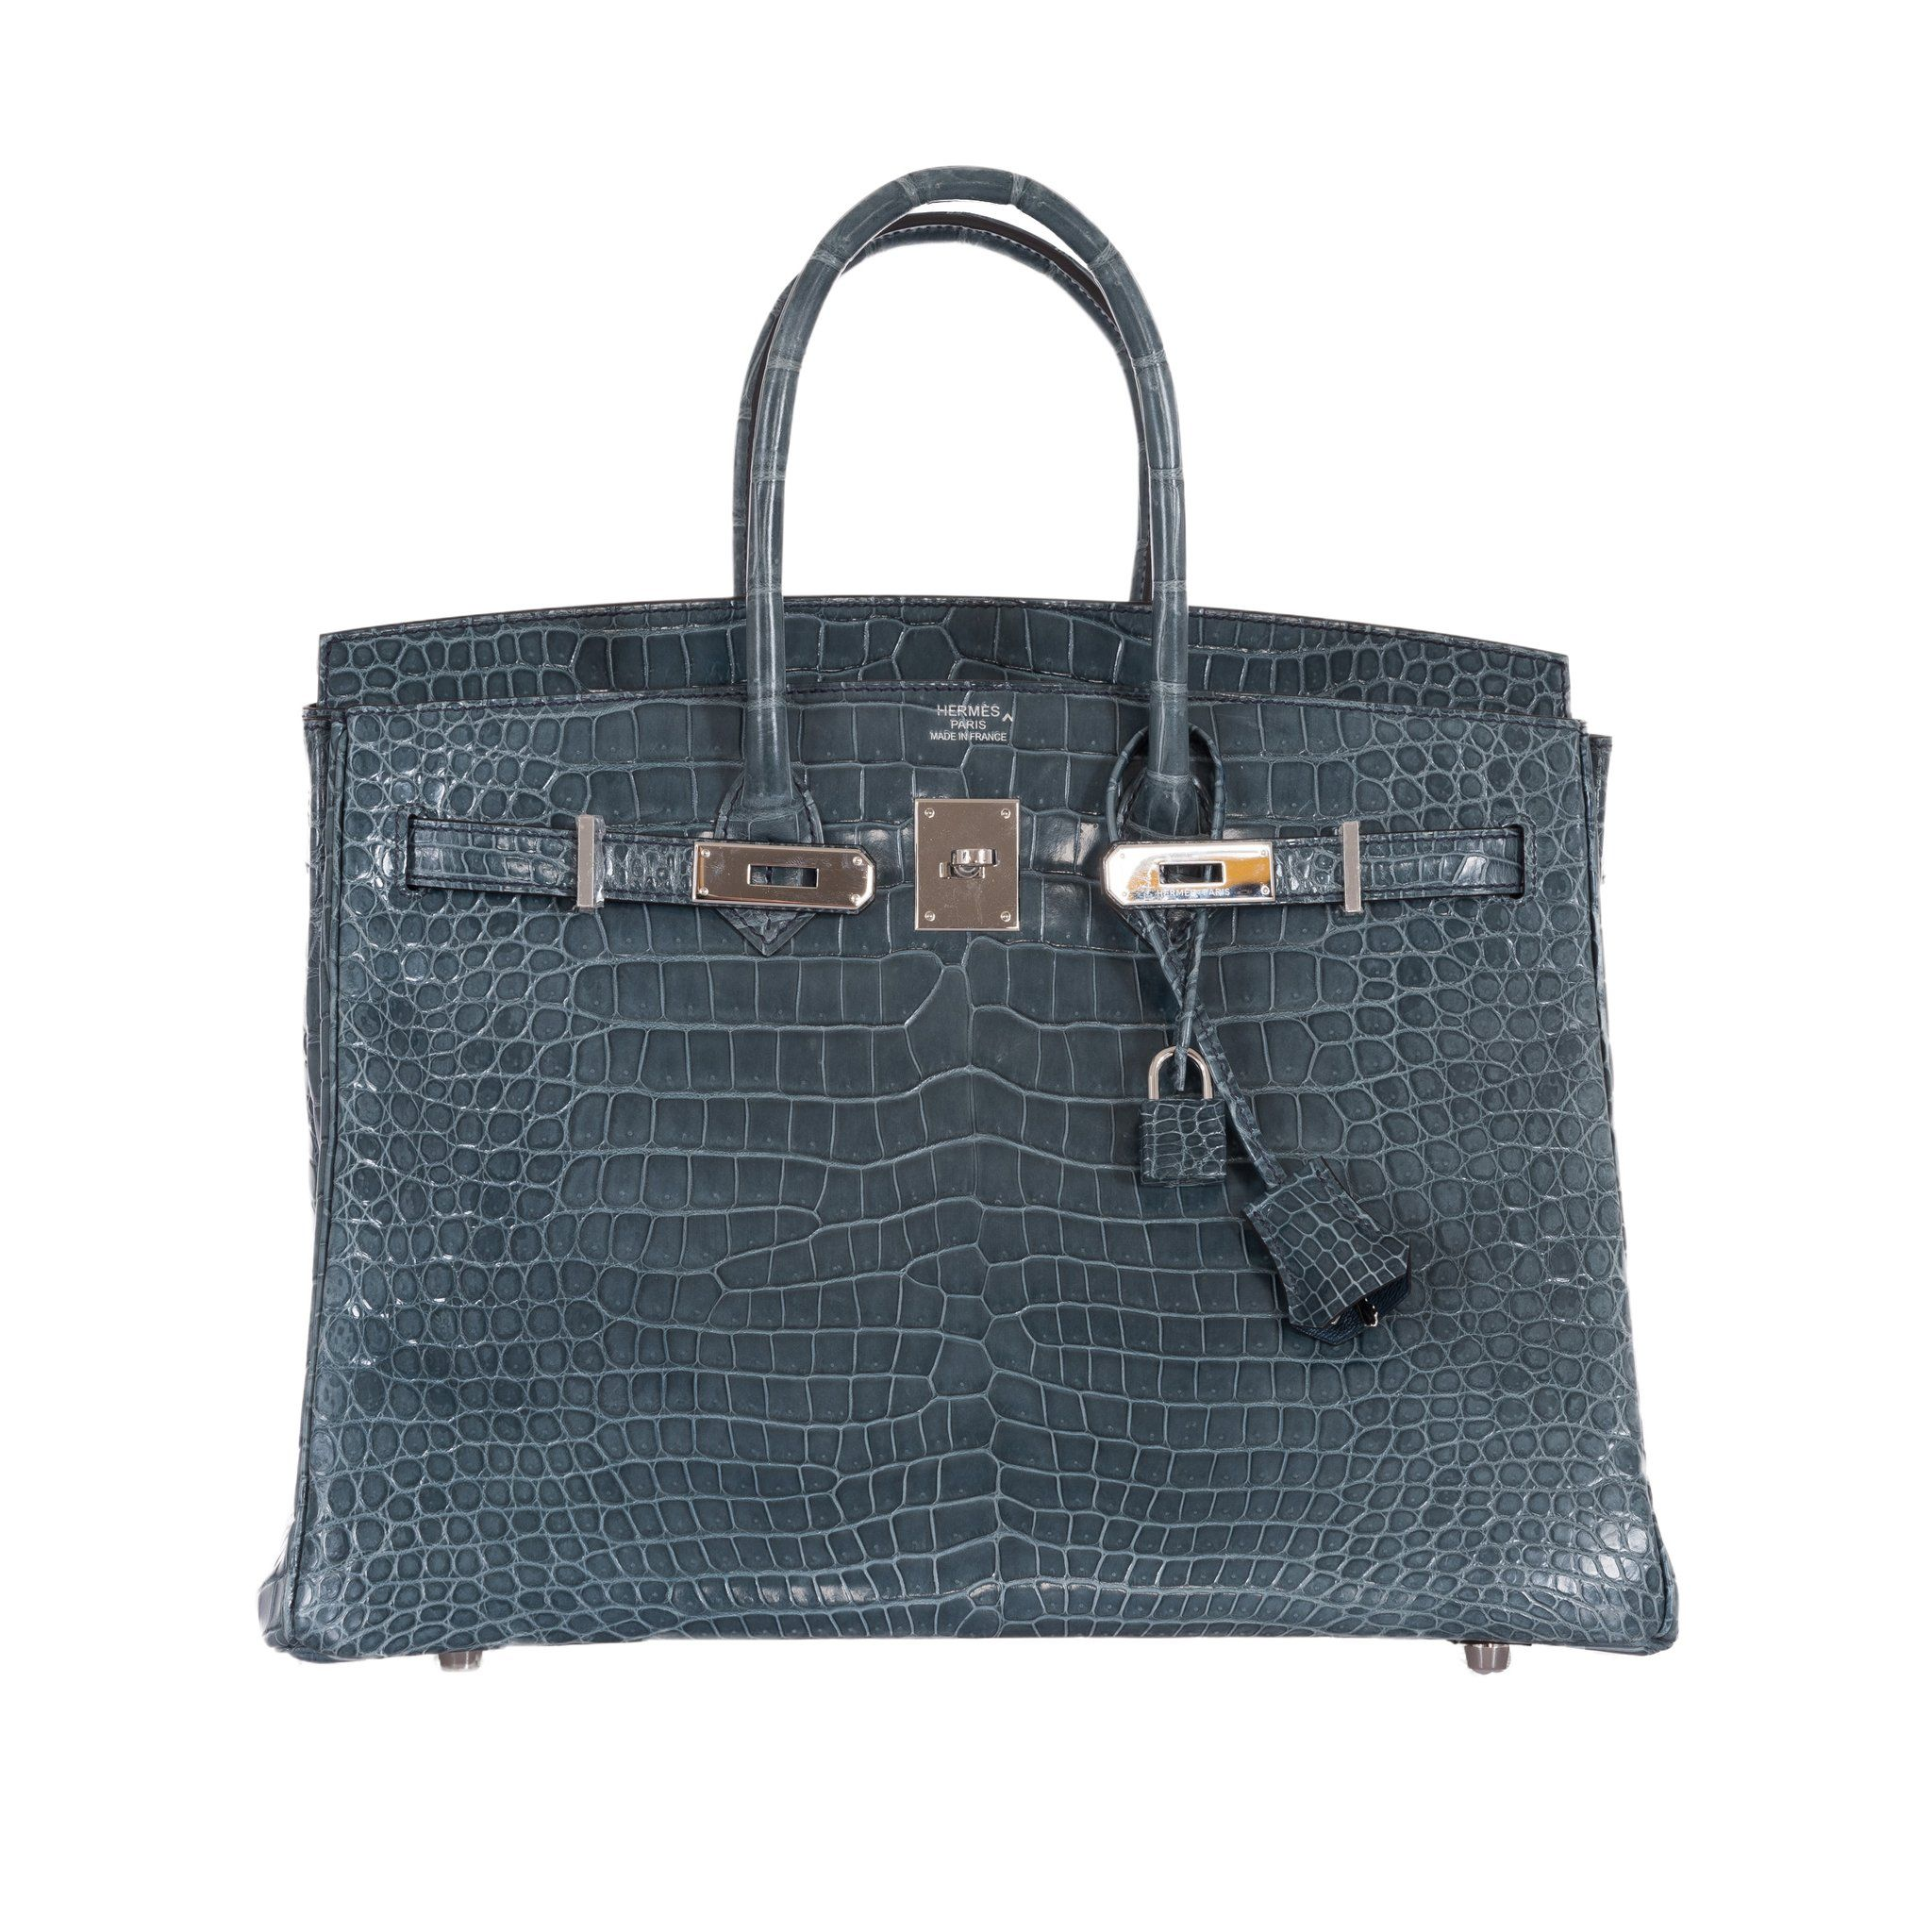 e5f05999248d Hermes Birkin 35 Blue Jean Crocodile Porosus Palladium Hardware-Hermes -JaneFinds